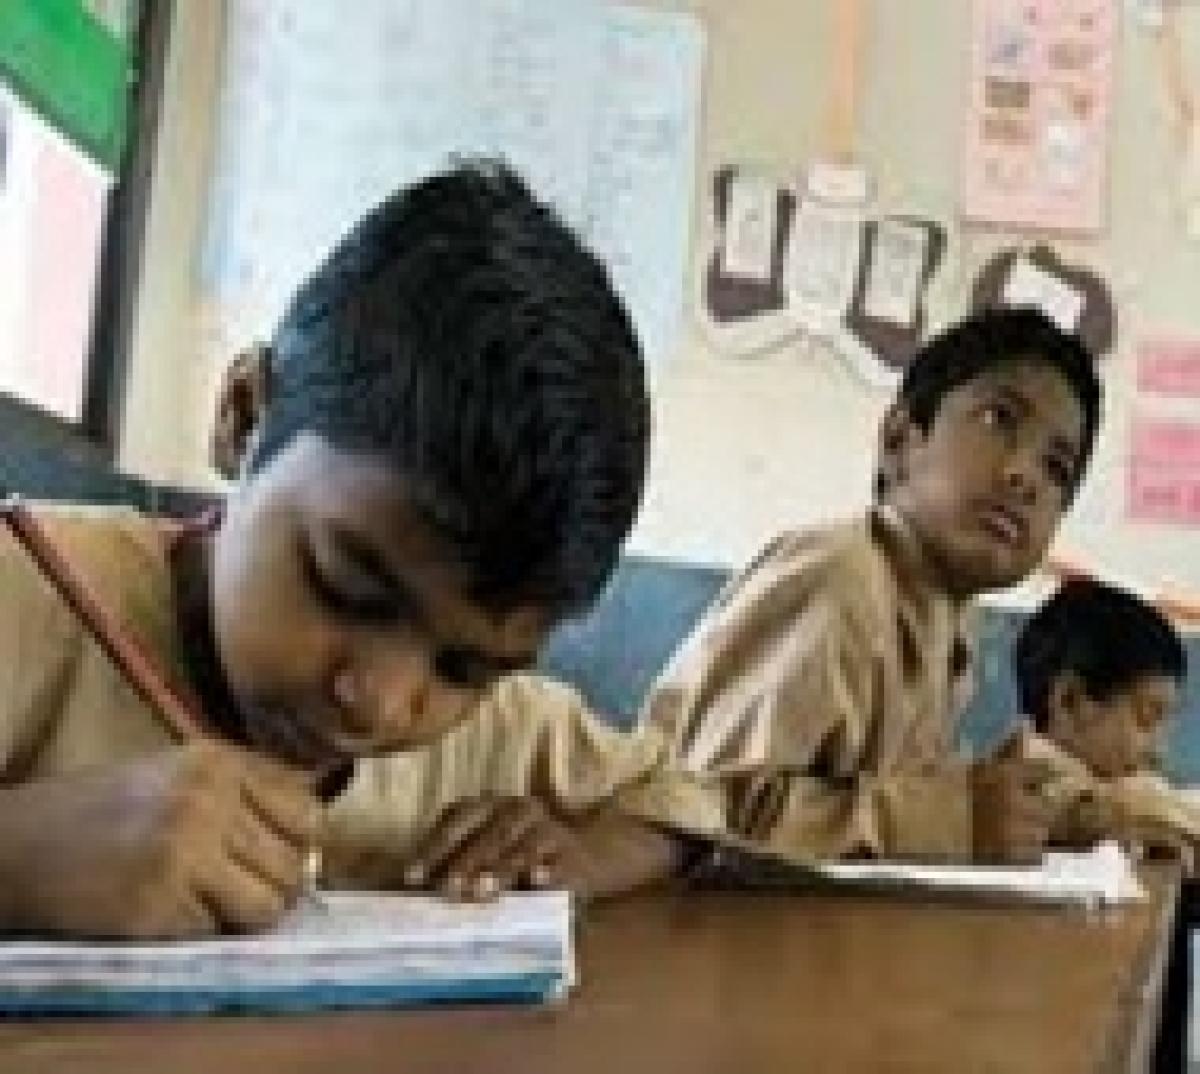 Bhopal: Shramodaya Vidyalayas to provide free education to labourers children